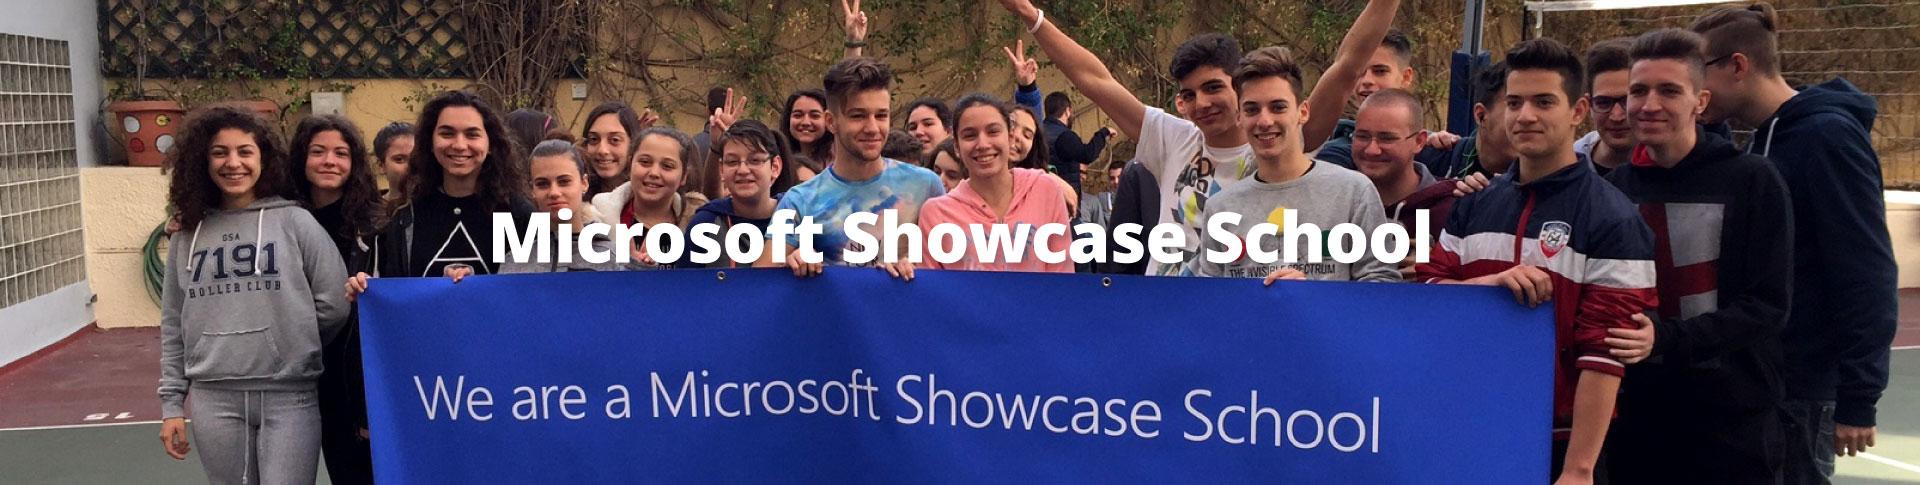 Microsoft Showcase School